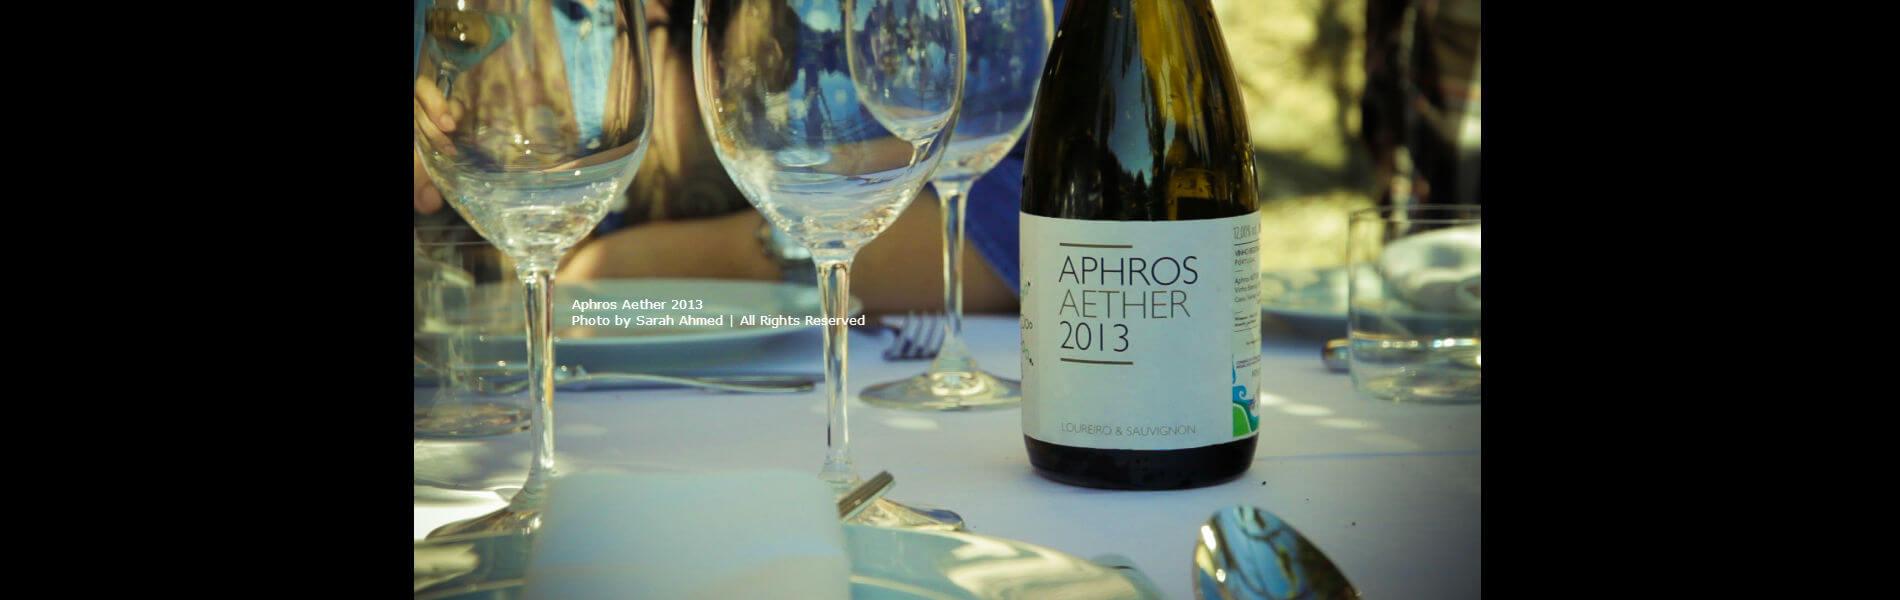 Blend-All-About-Wine-Aphros-Cutting-Edge-of-Biodynamics-Slider